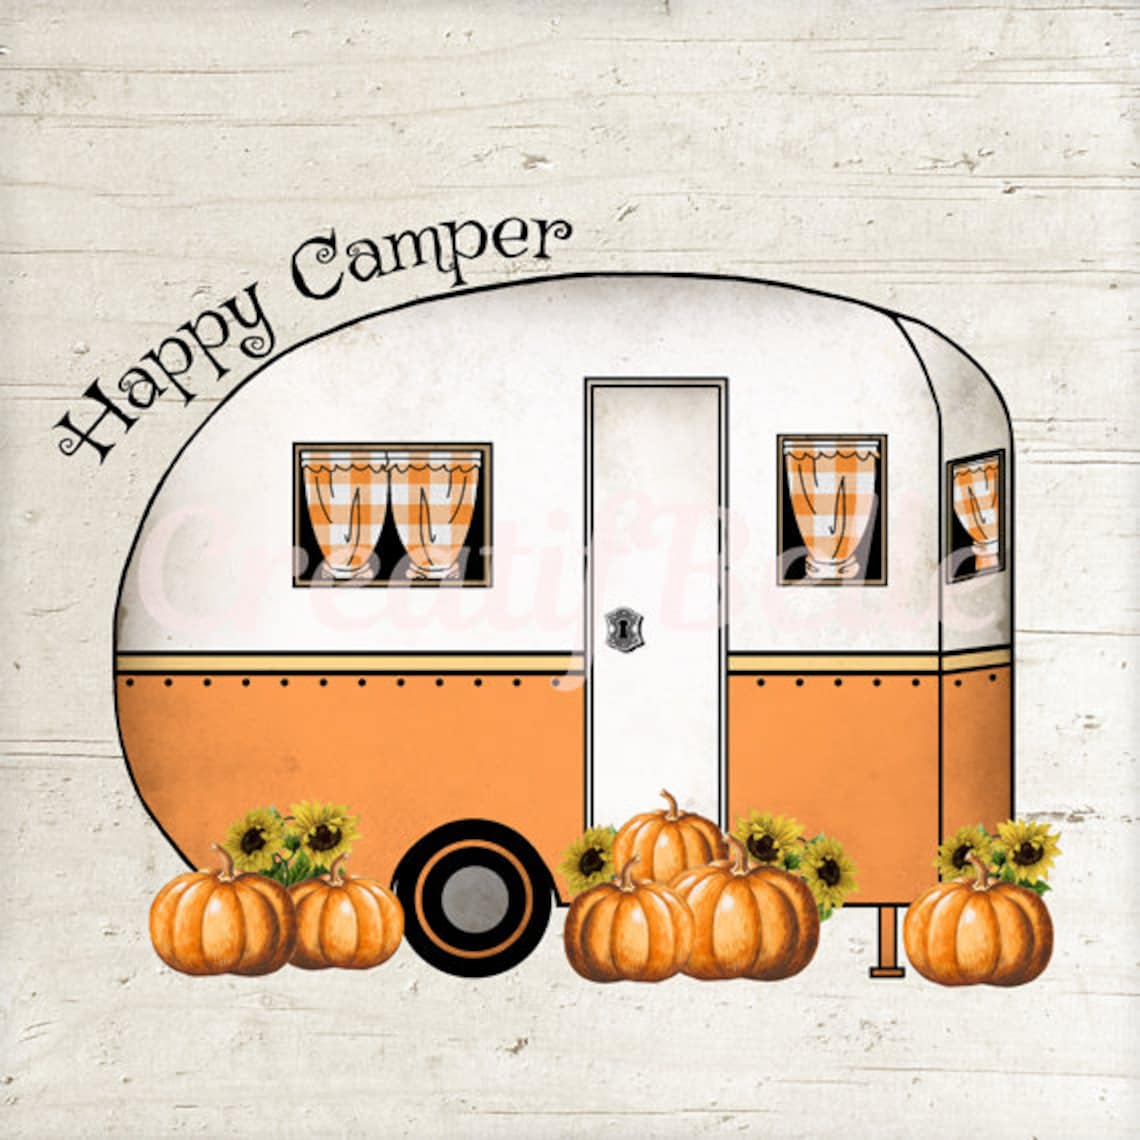 Happy Camper Pumpkins Instant Digital Download Printable Graphic Transfer Image